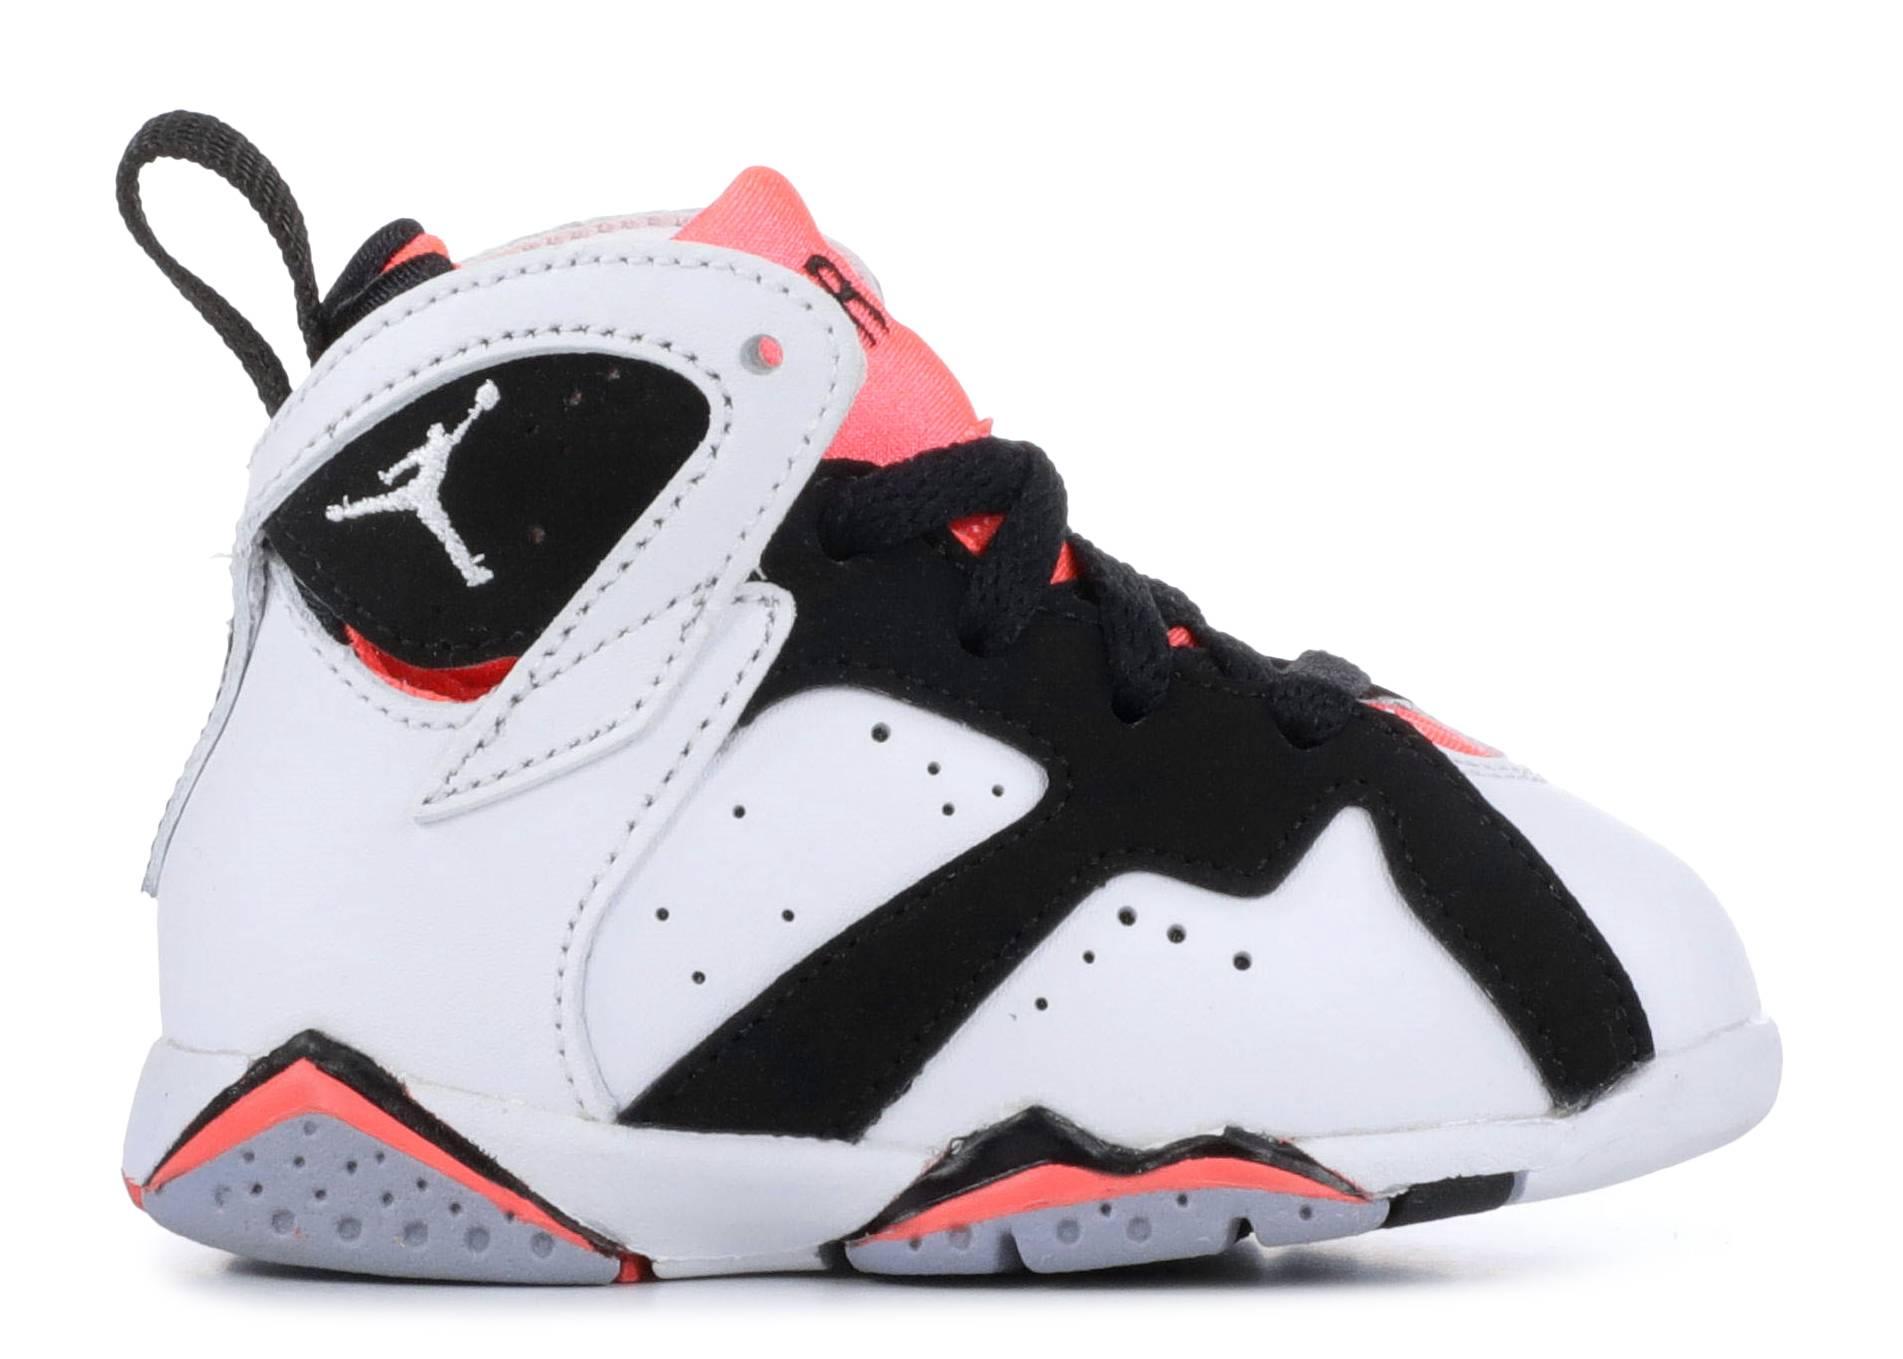 a575b1546bd2 Jordan 7 Retro Gt - Nike - 705418 106 - white white -black hot lava ...